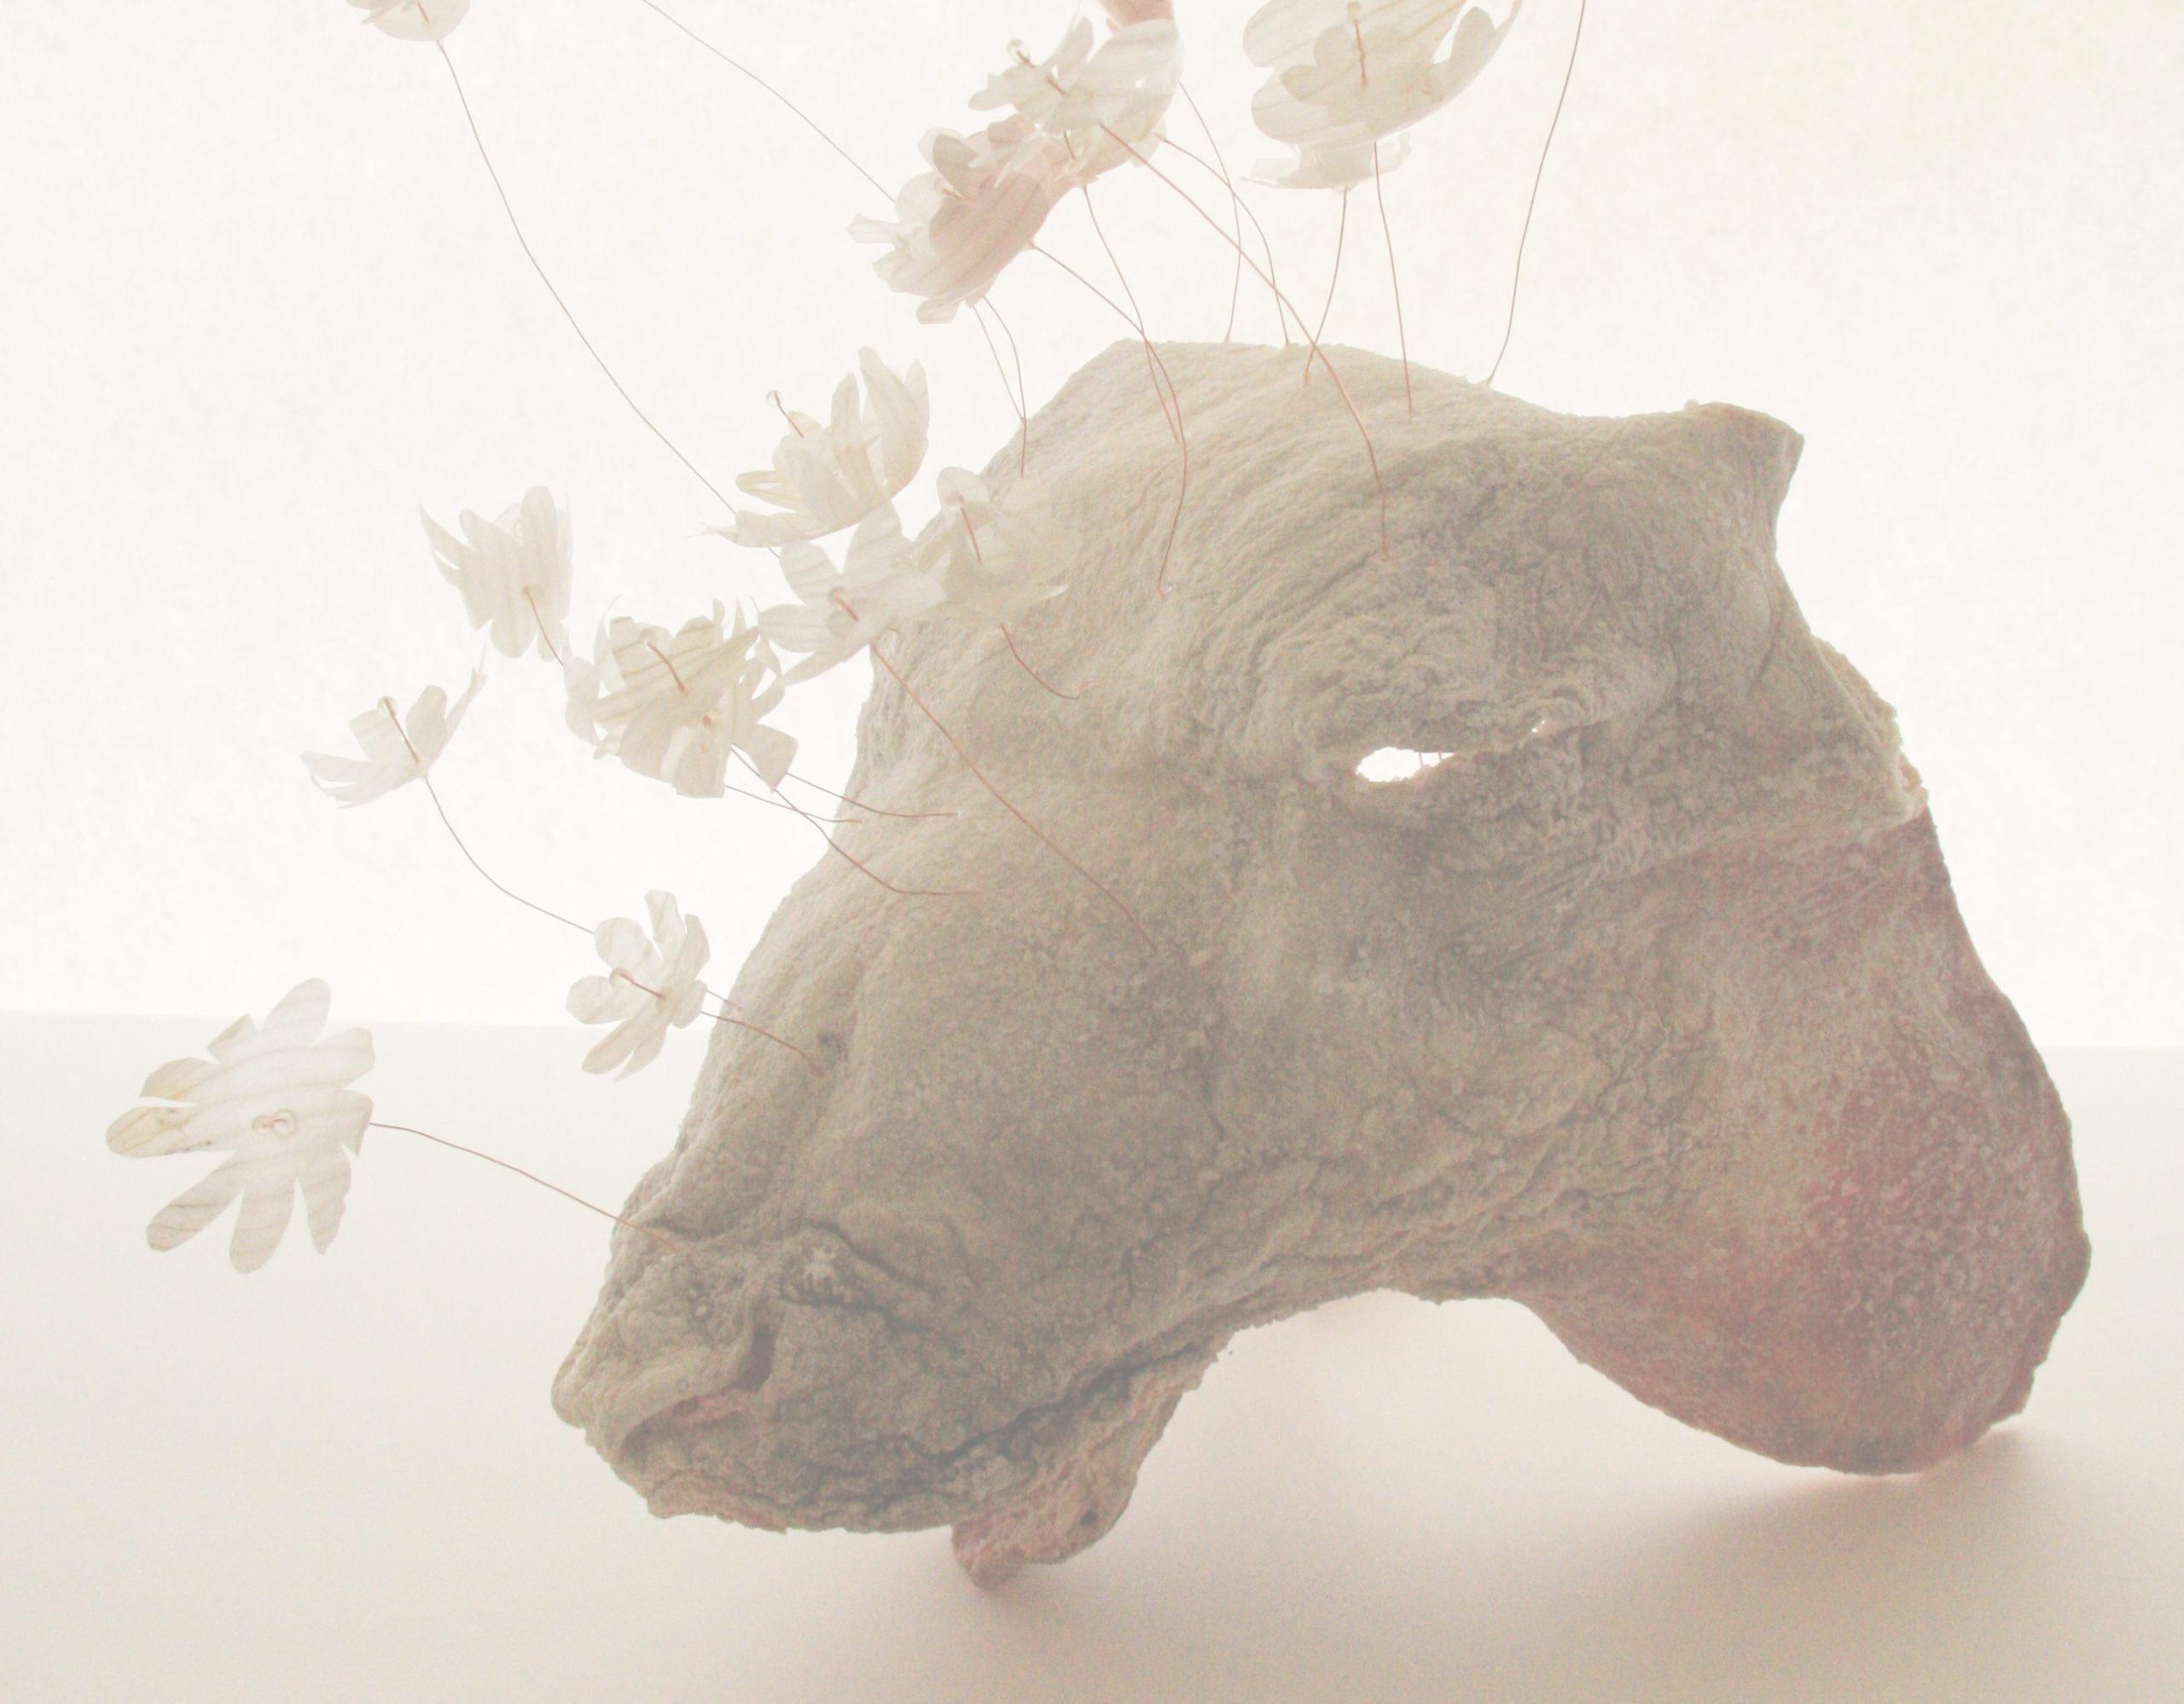 chicco margaroli arte – 02